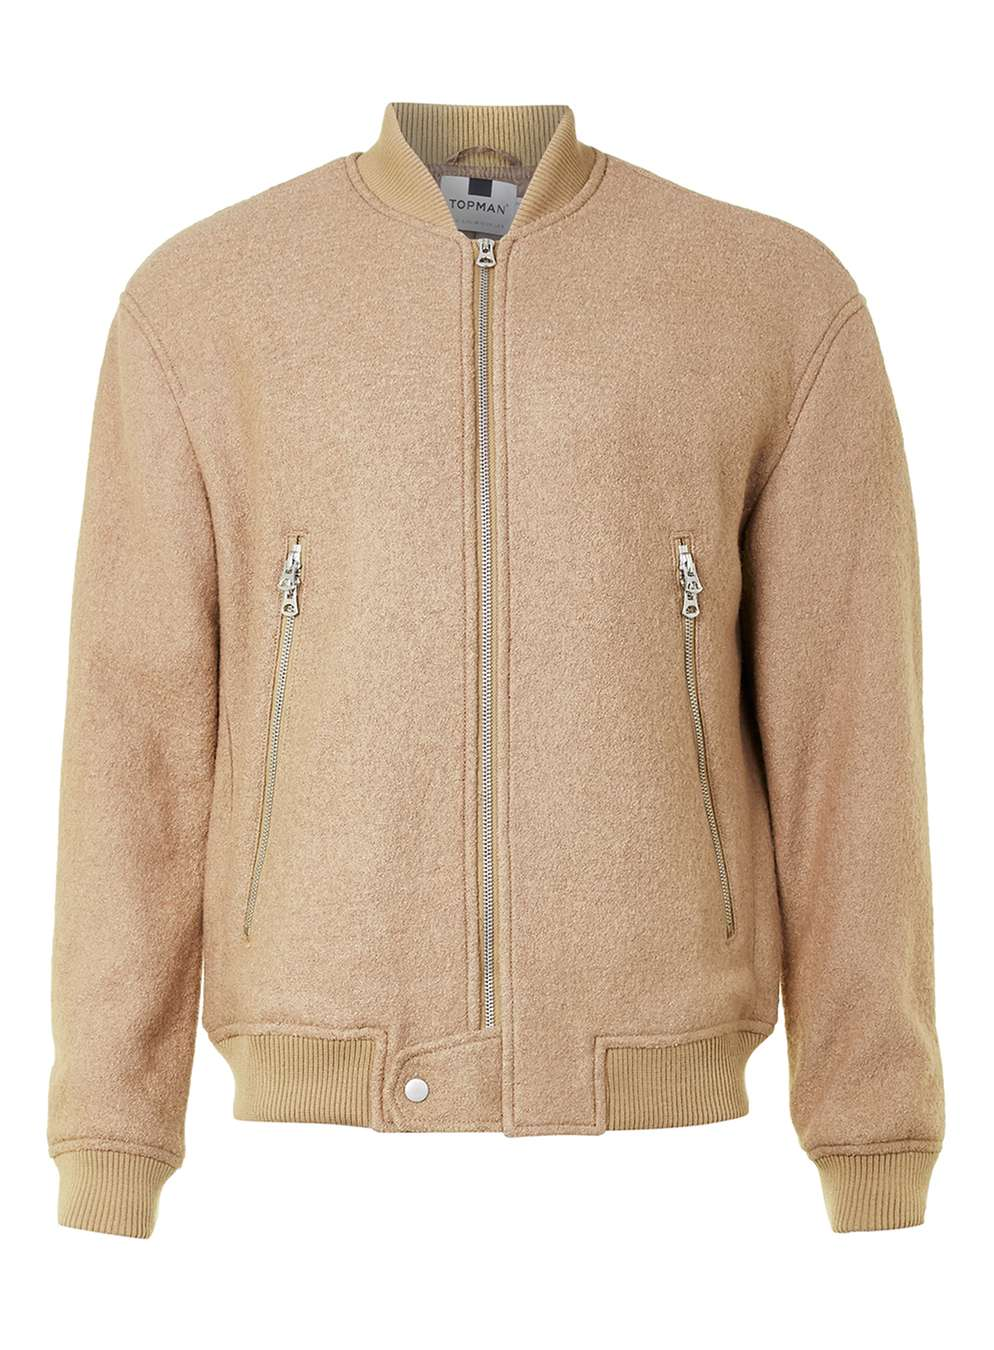 Camel Bomber Jacket